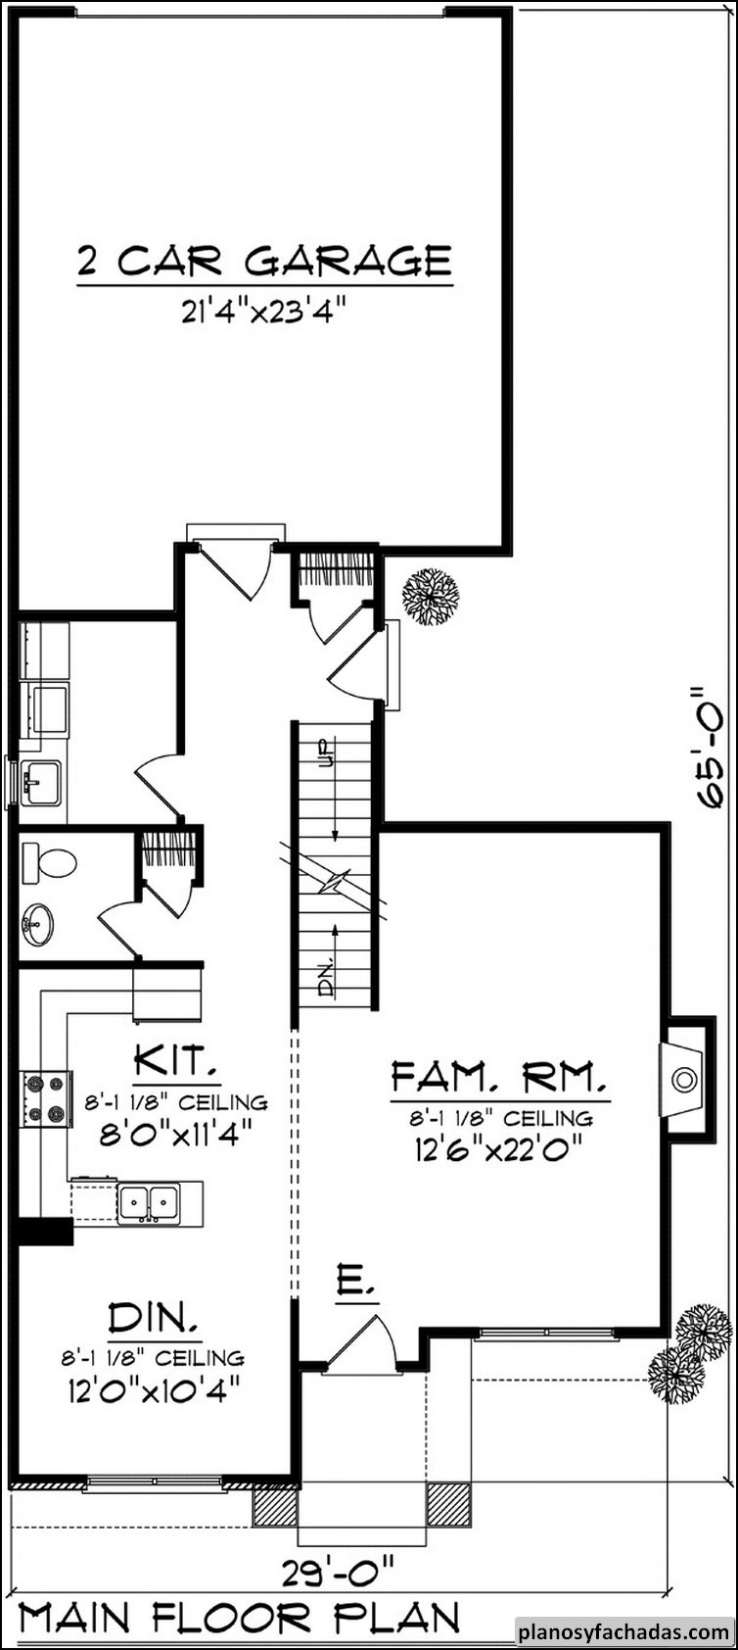 planos-de-casas-221260-FP.jpg